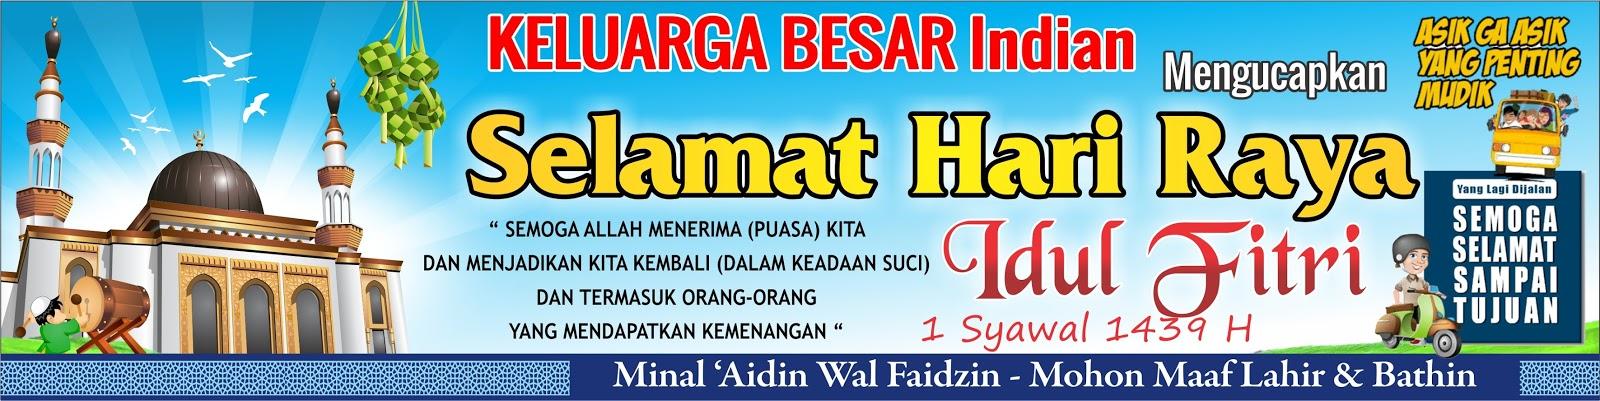 8 Contoh Spanduk Idul Fitri Terbaru 1439 H / 2018 M ...